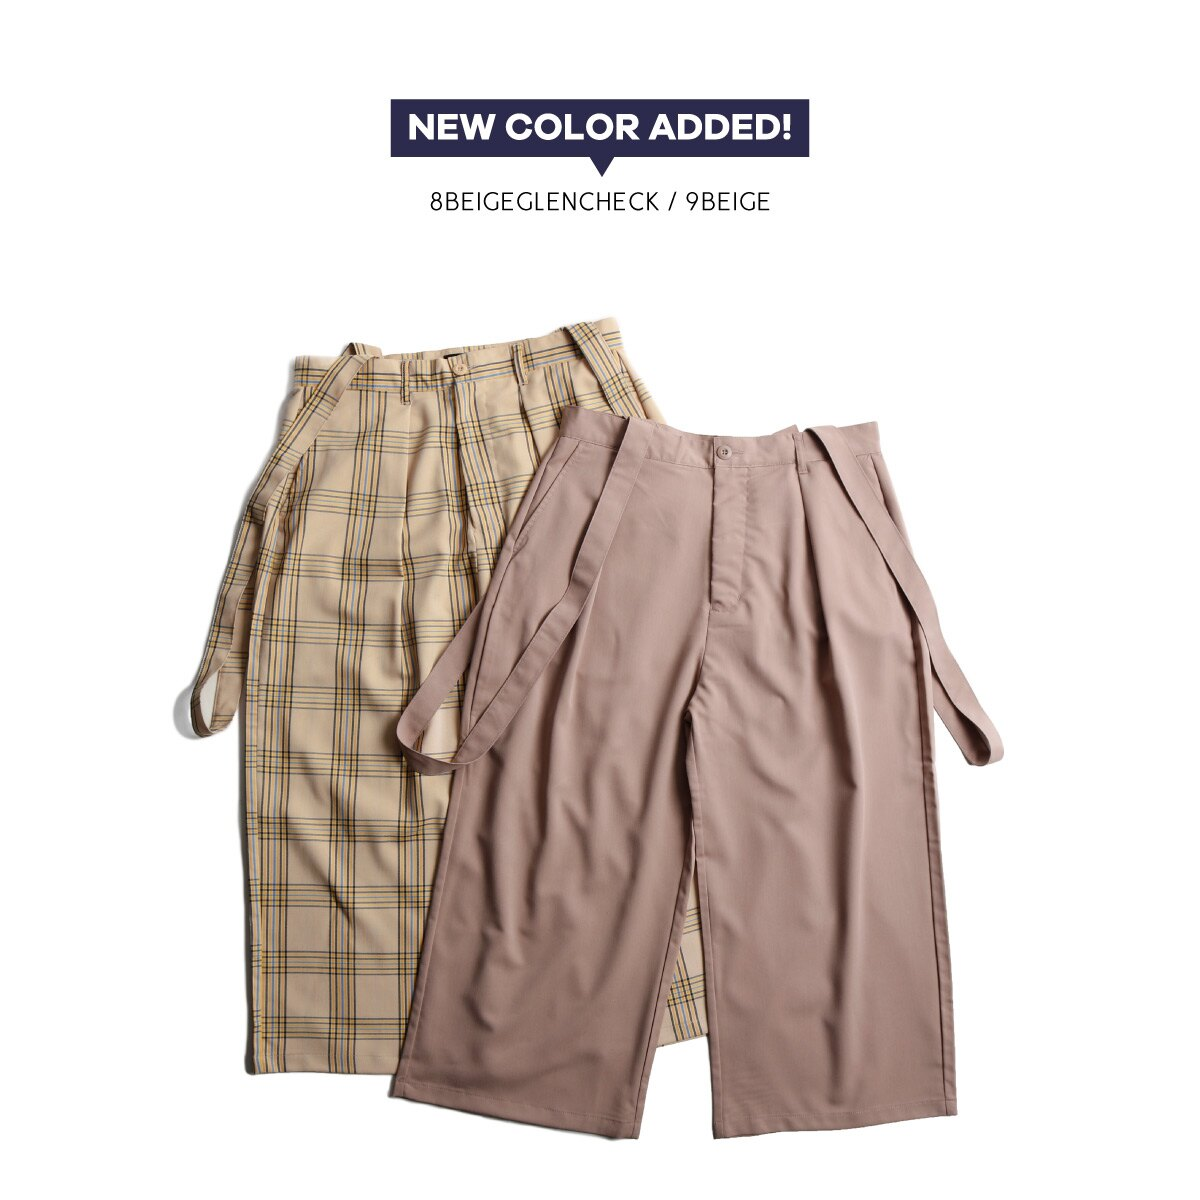 Gaucho寬褲 吊帶褲 8